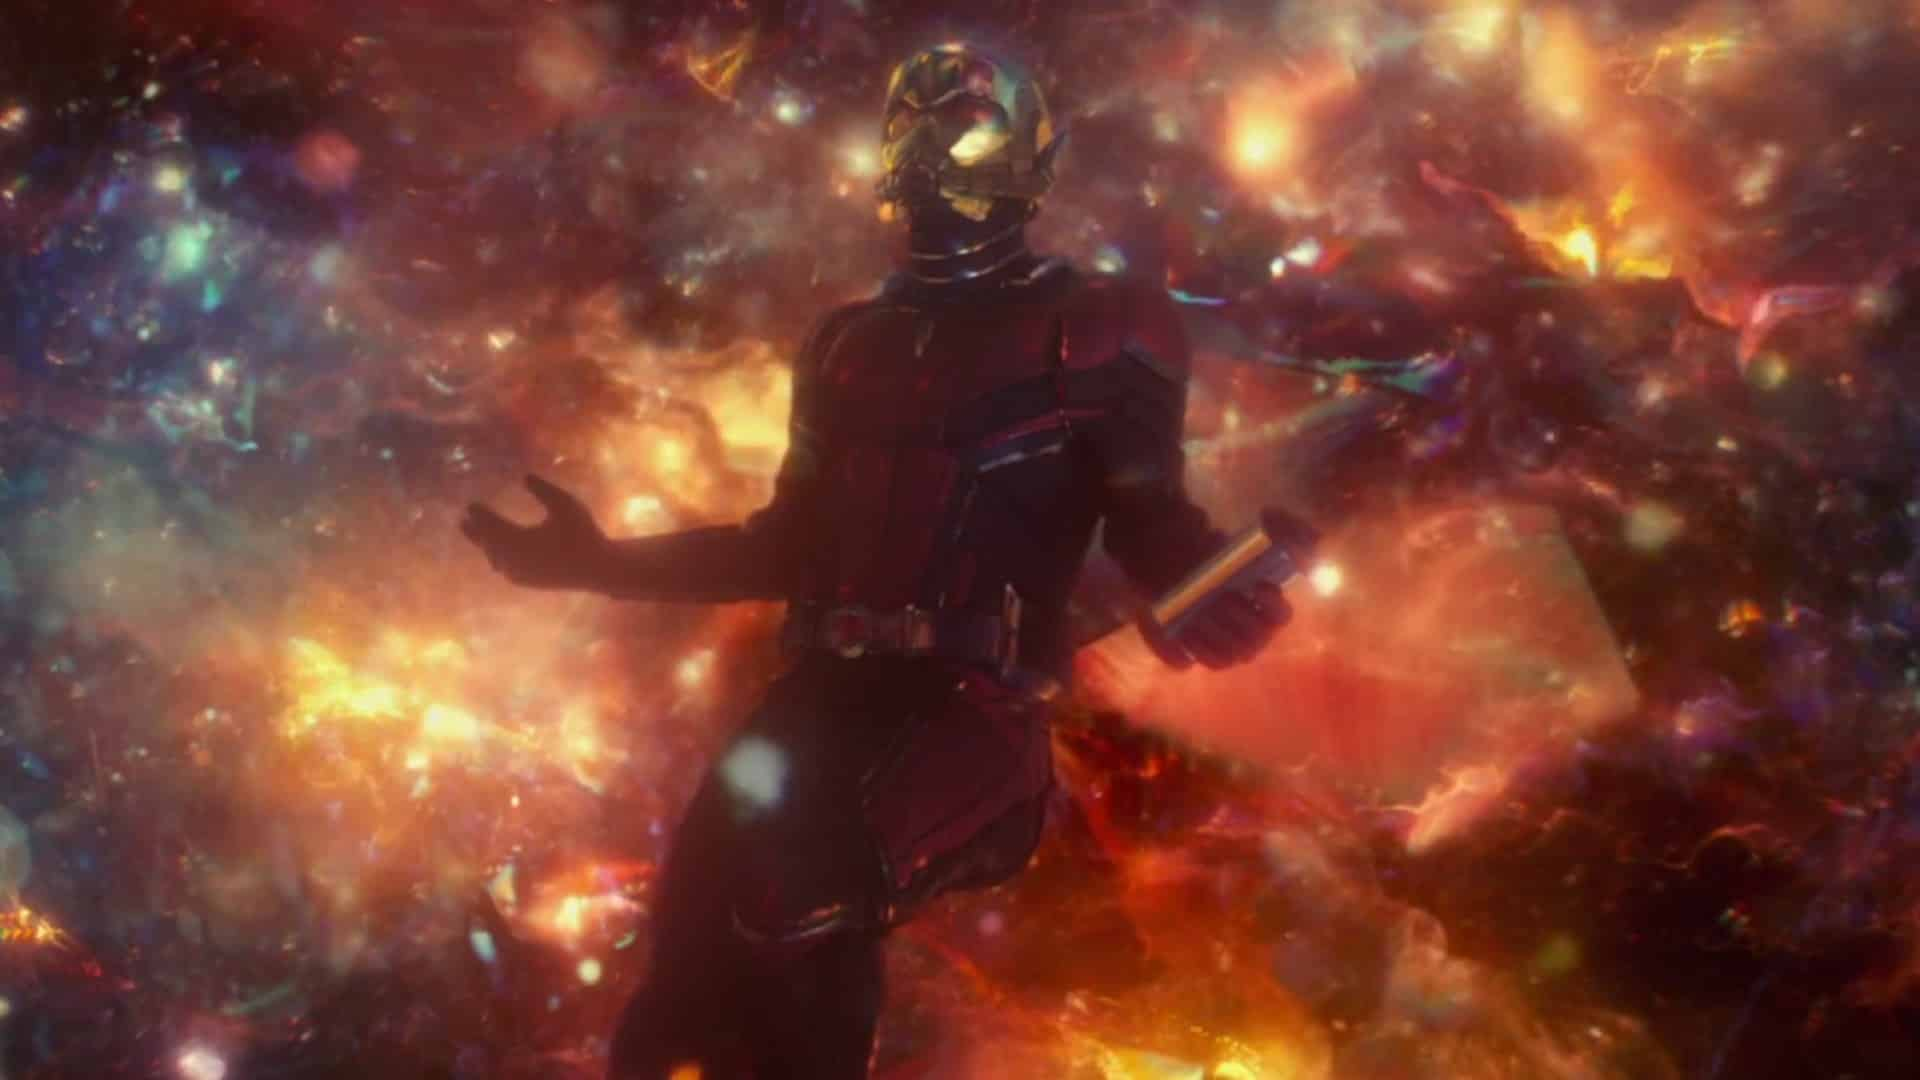 ant-man quantum realm avengers 5